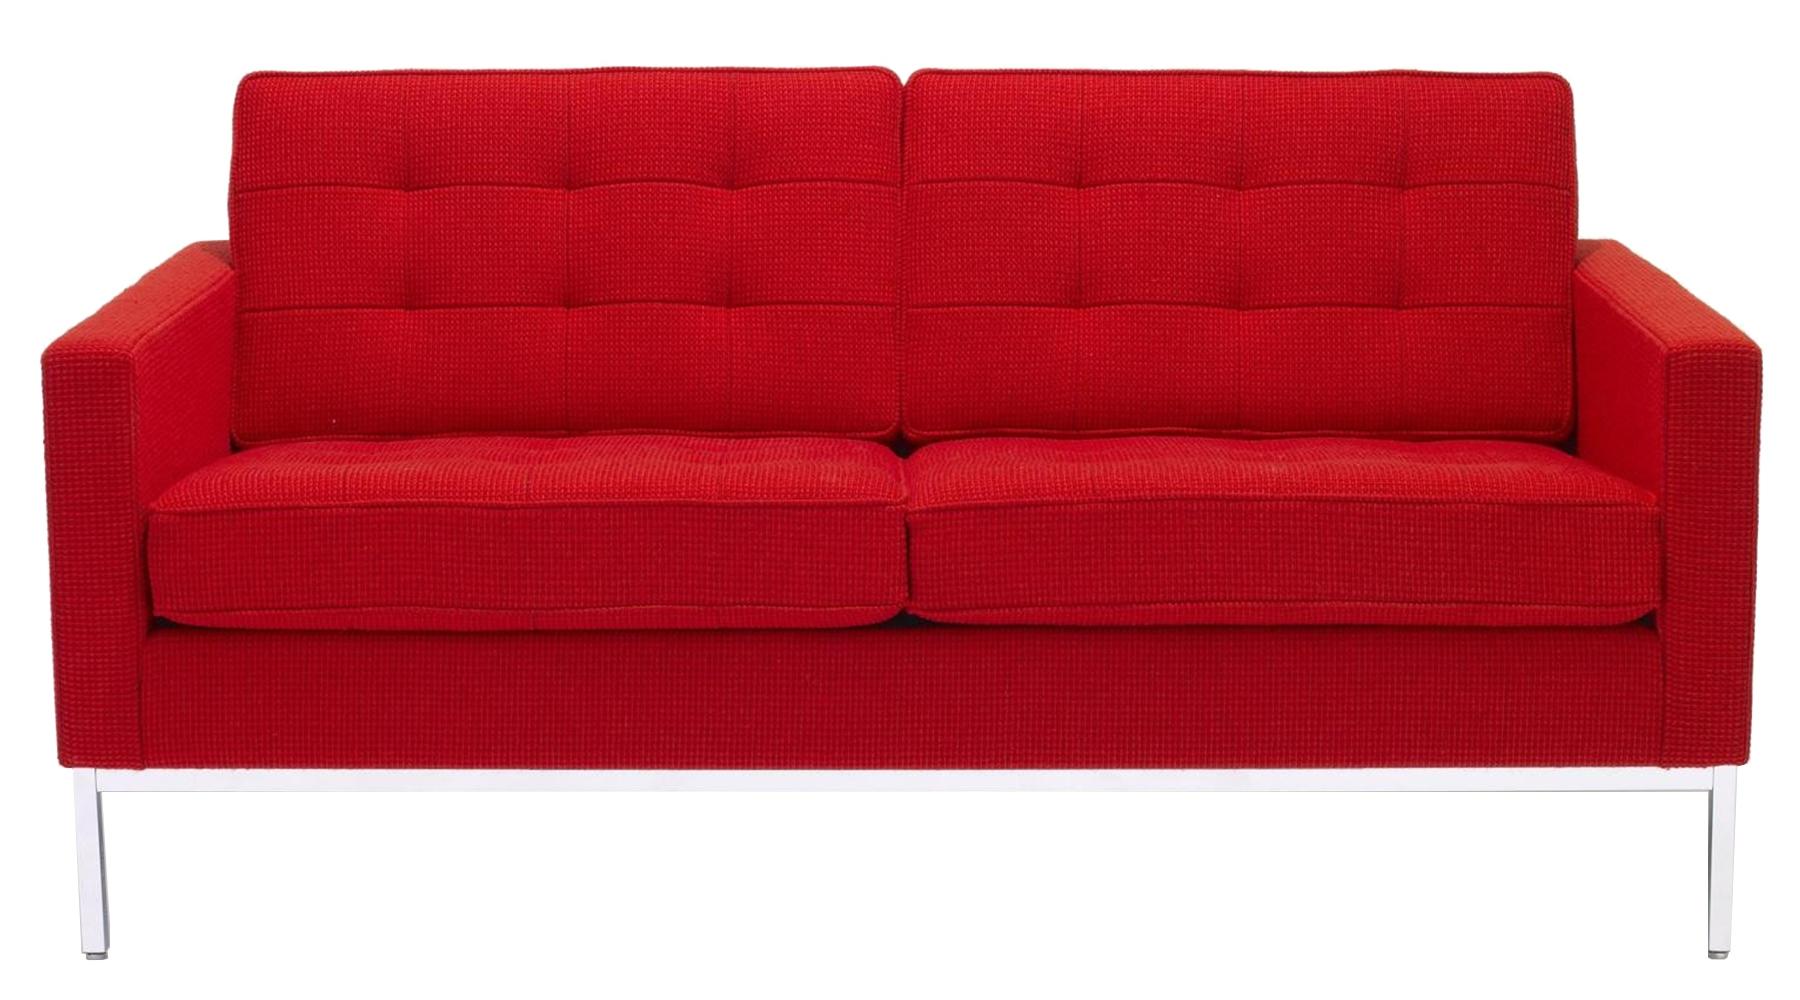 knoll dvouseda ky florence sofa designov seda ky designpropaganda. Black Bedroom Furniture Sets. Home Design Ideas